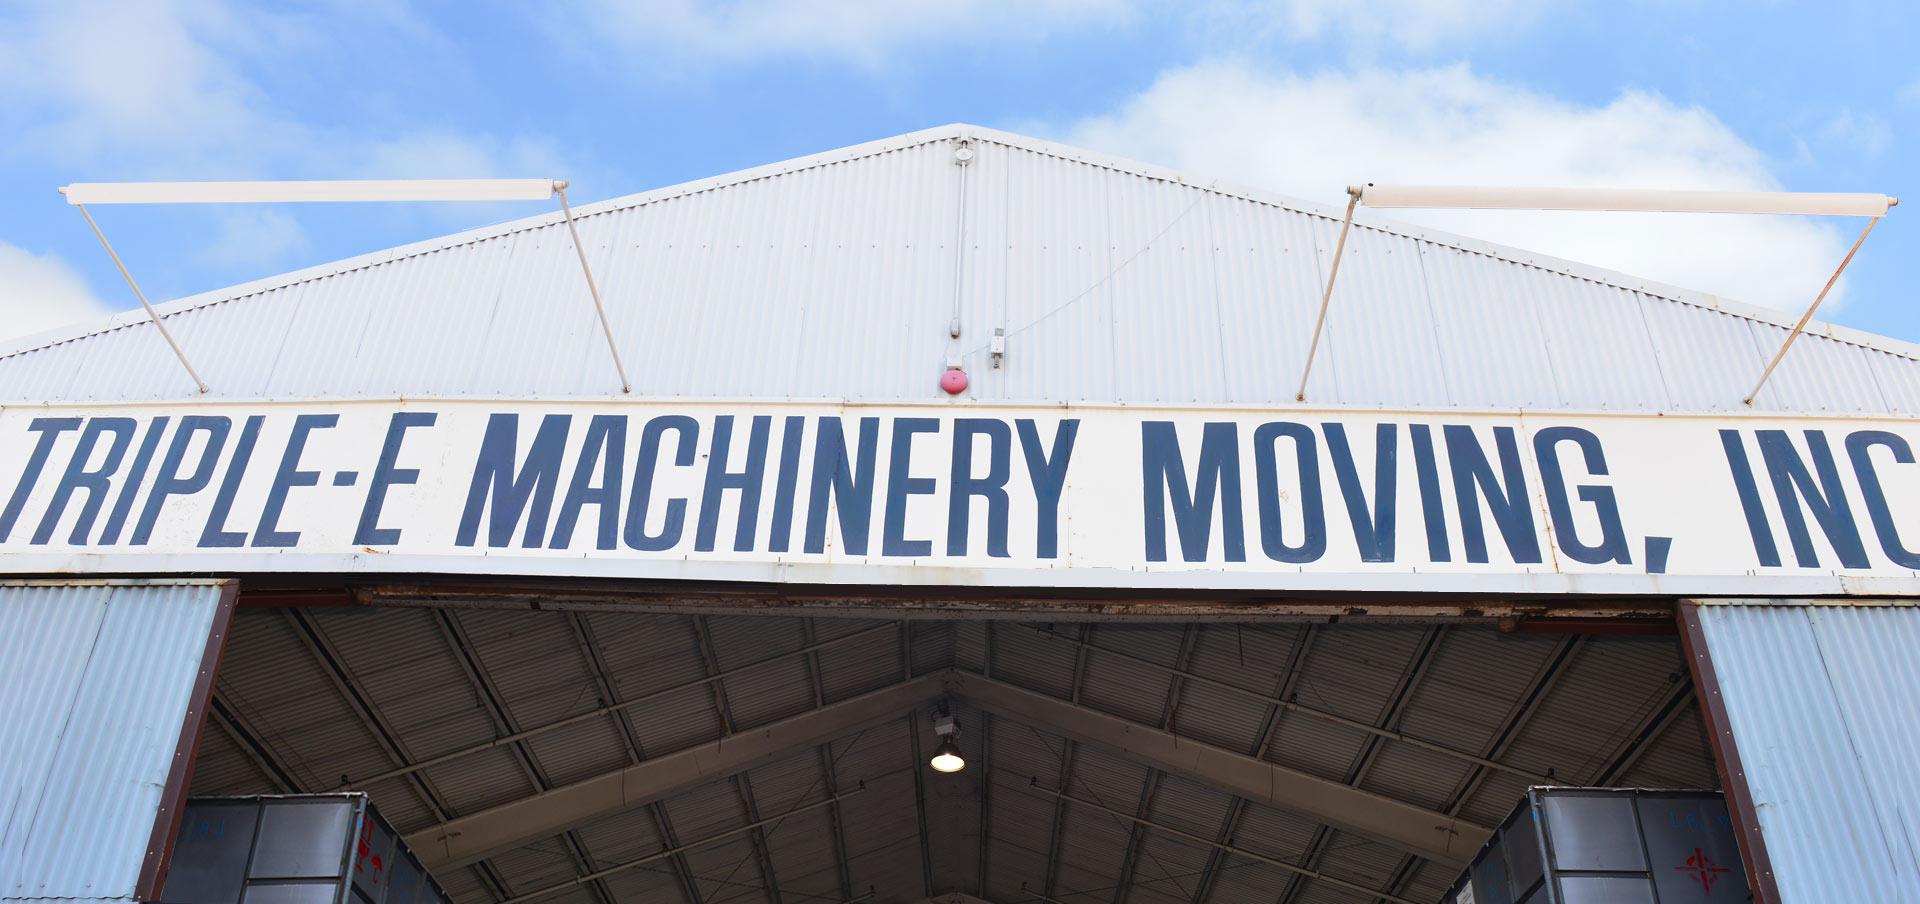 Triple-E Machinery Moving, Inc.